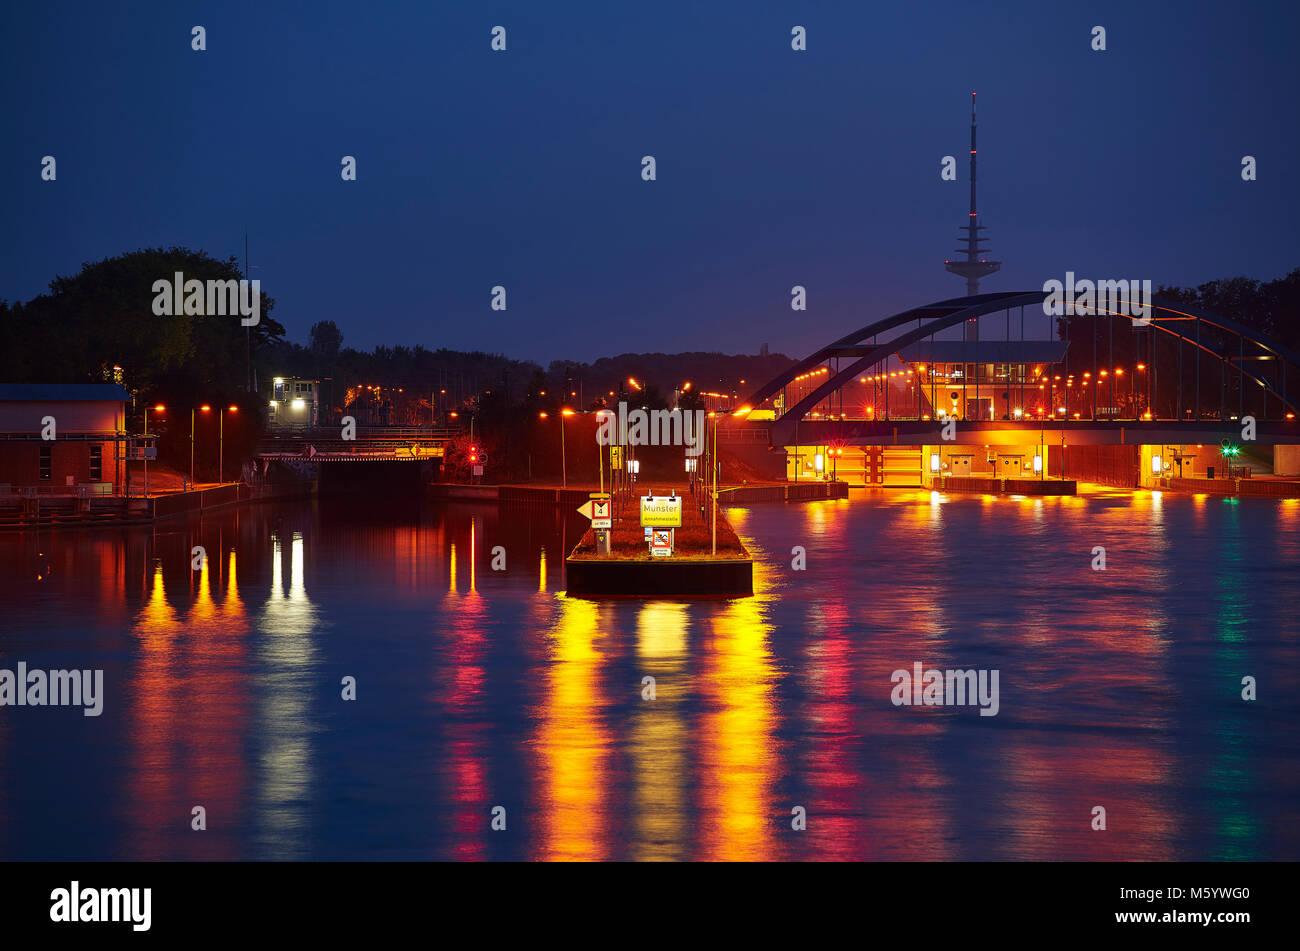 Kanalschleuse in Münster - Stock Image